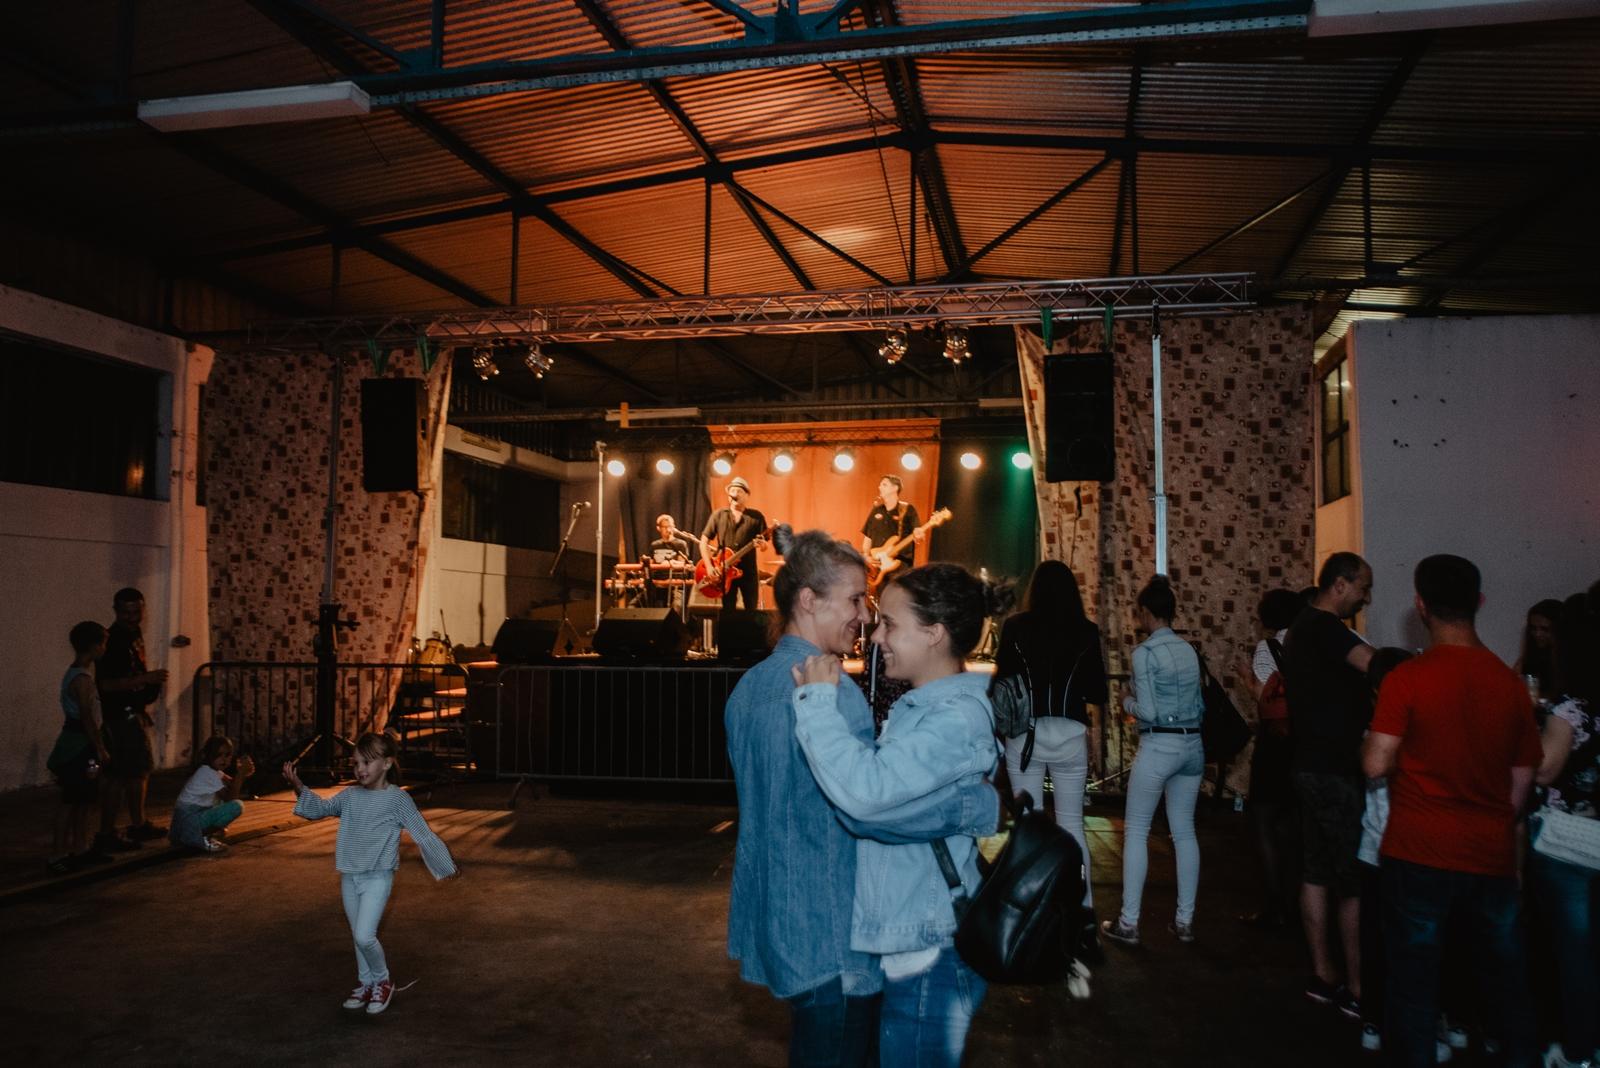 likaclub_korenica_neno-belan_2019-32